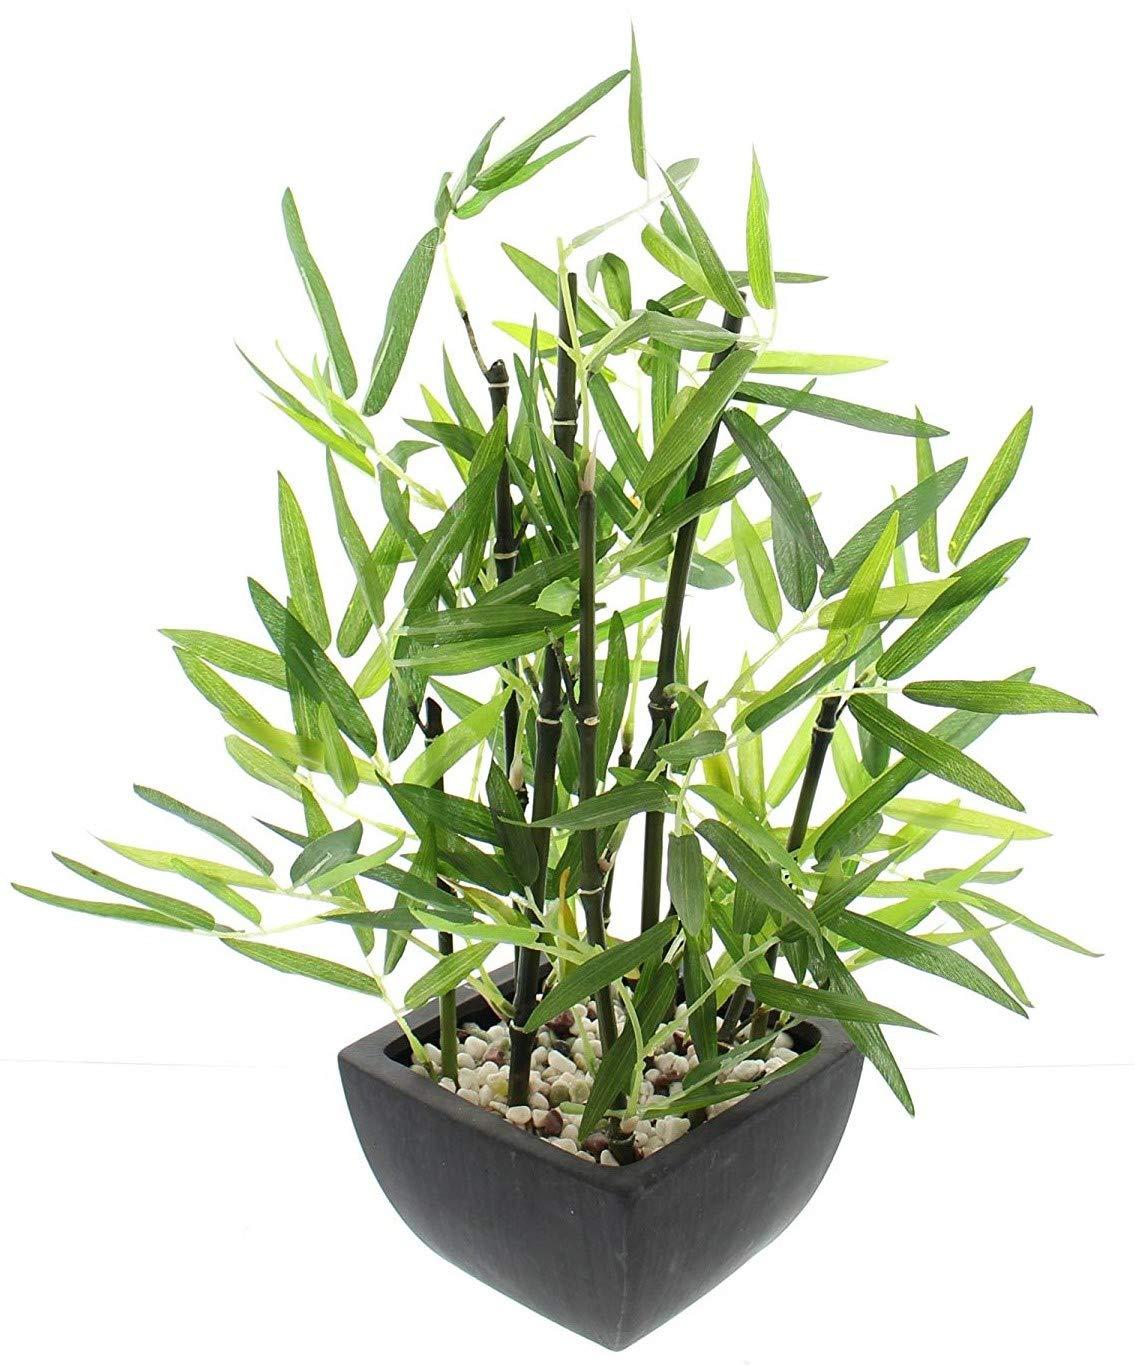 khevga – Planta de bambú decorativa en maceta